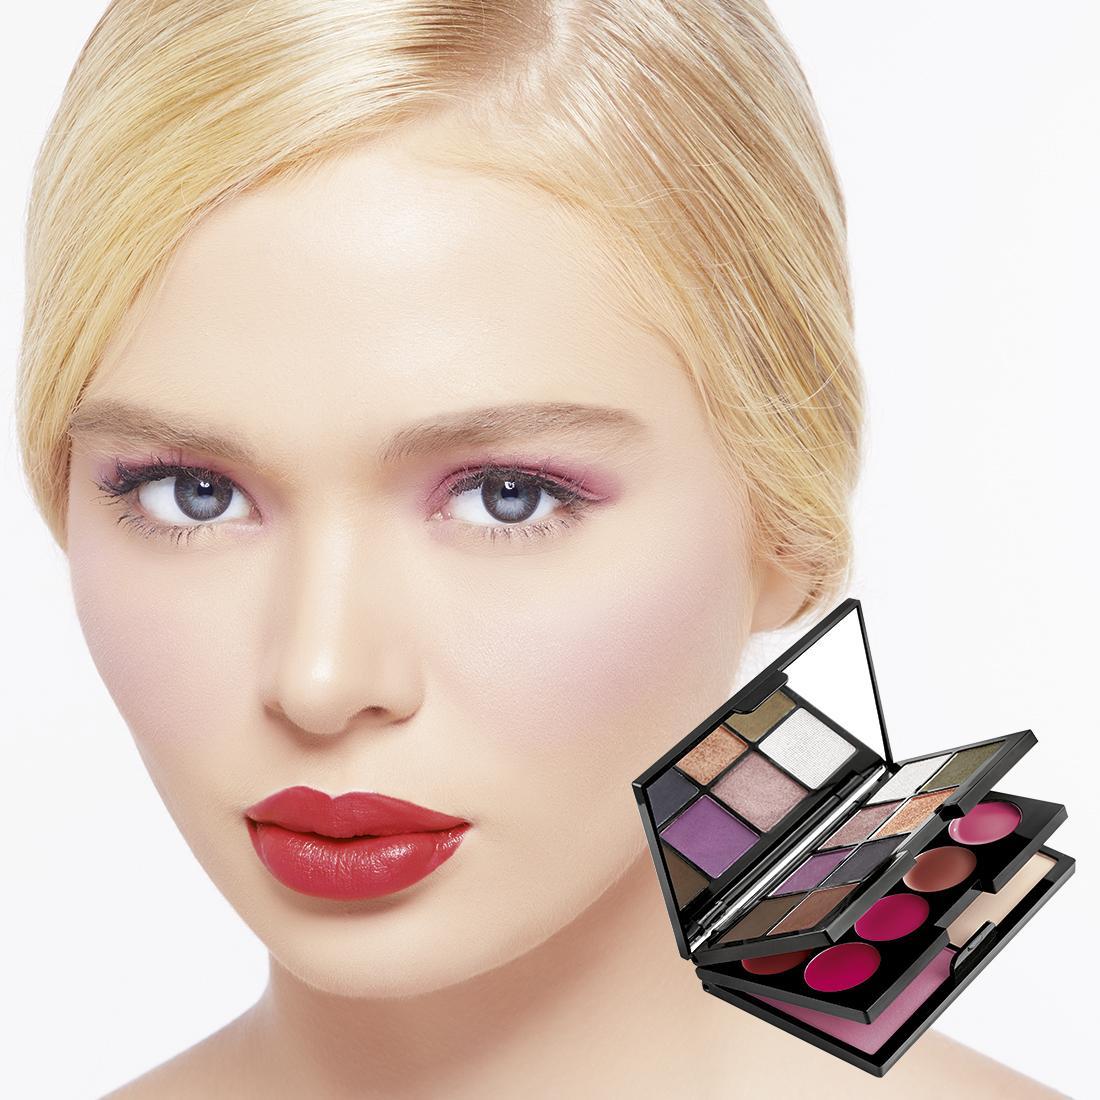 Jual Kuas Aplikator Make Up Tas Kosmetik Mata Pouch Eye Dompet Karakter Lucu Unik Brunbrun Paris Ultimate Beauty Palette